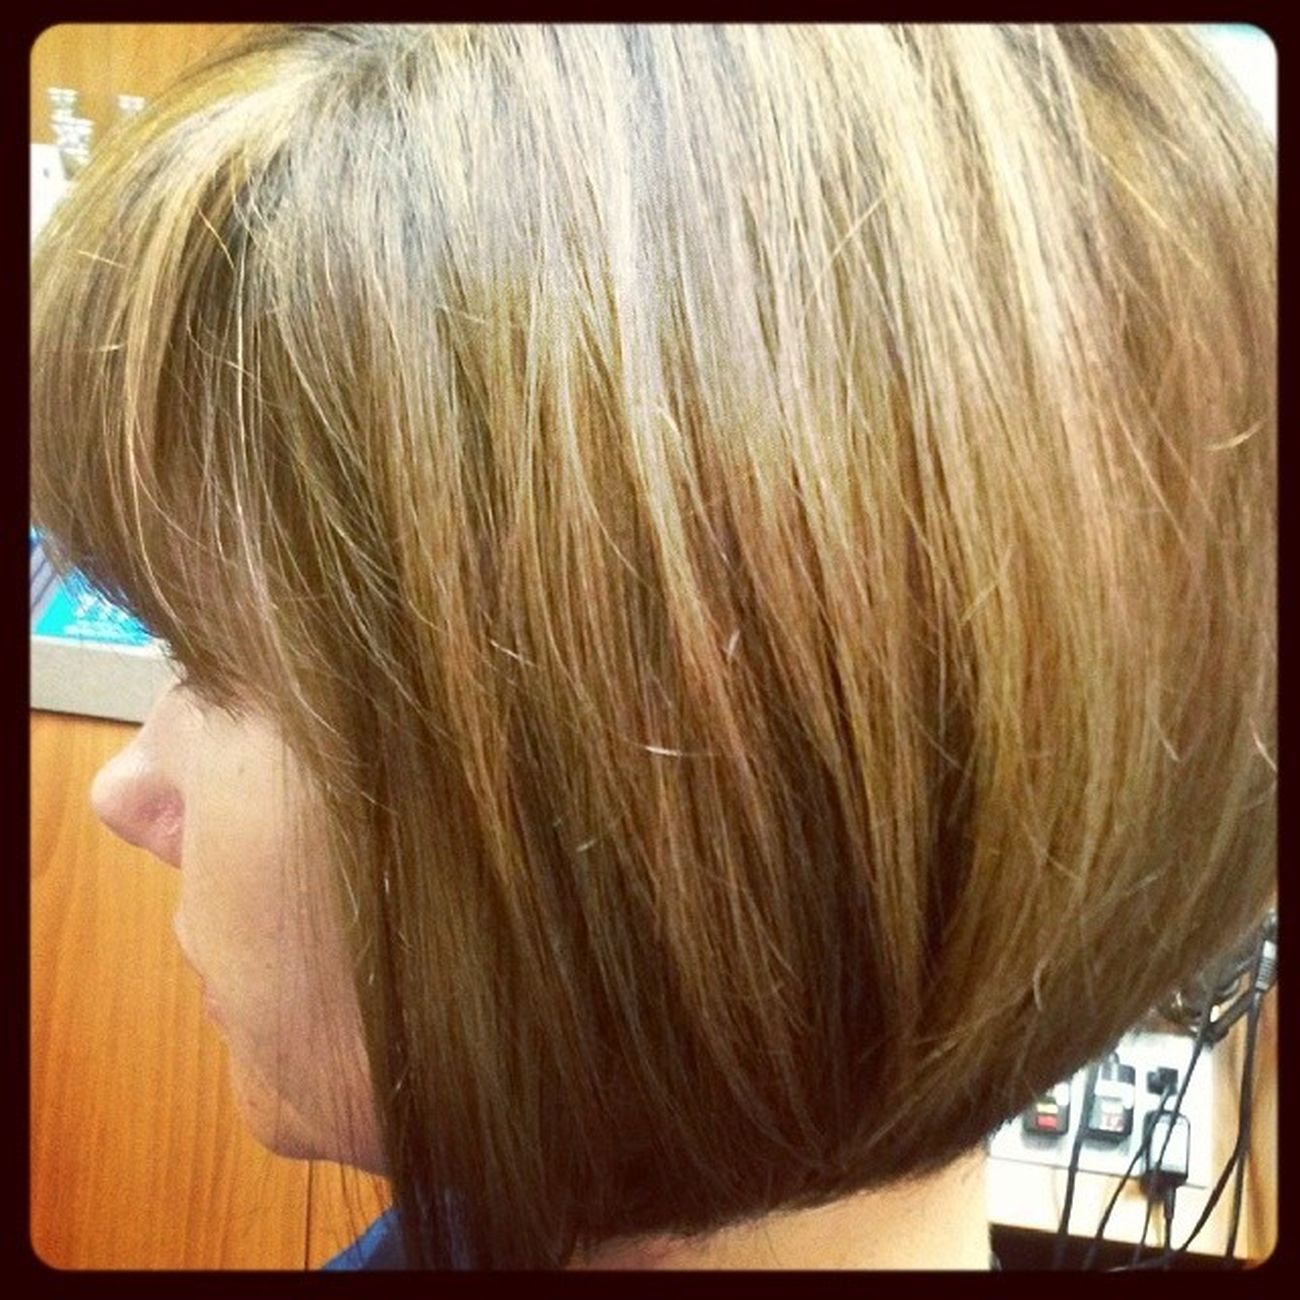 Cut color by Stefanía Longhairdontcare Lovemylife Hairdresserlife Hairgrowth